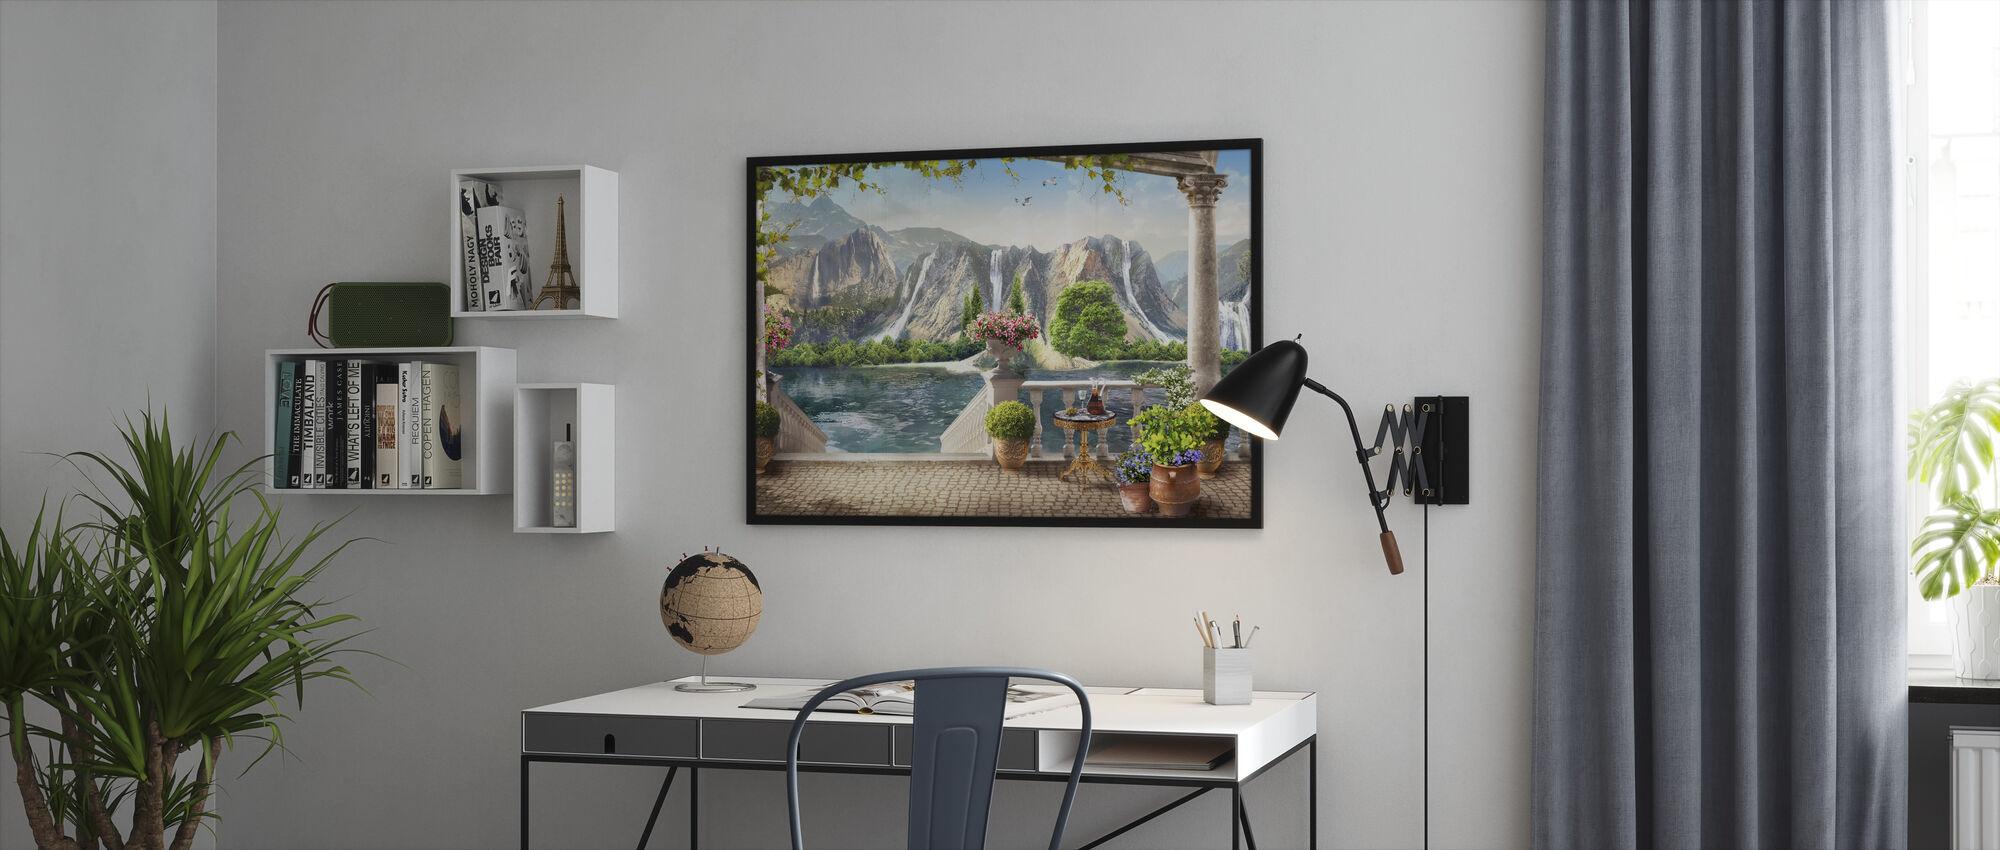 Fjell hage - Innrammet bilde - Kontor